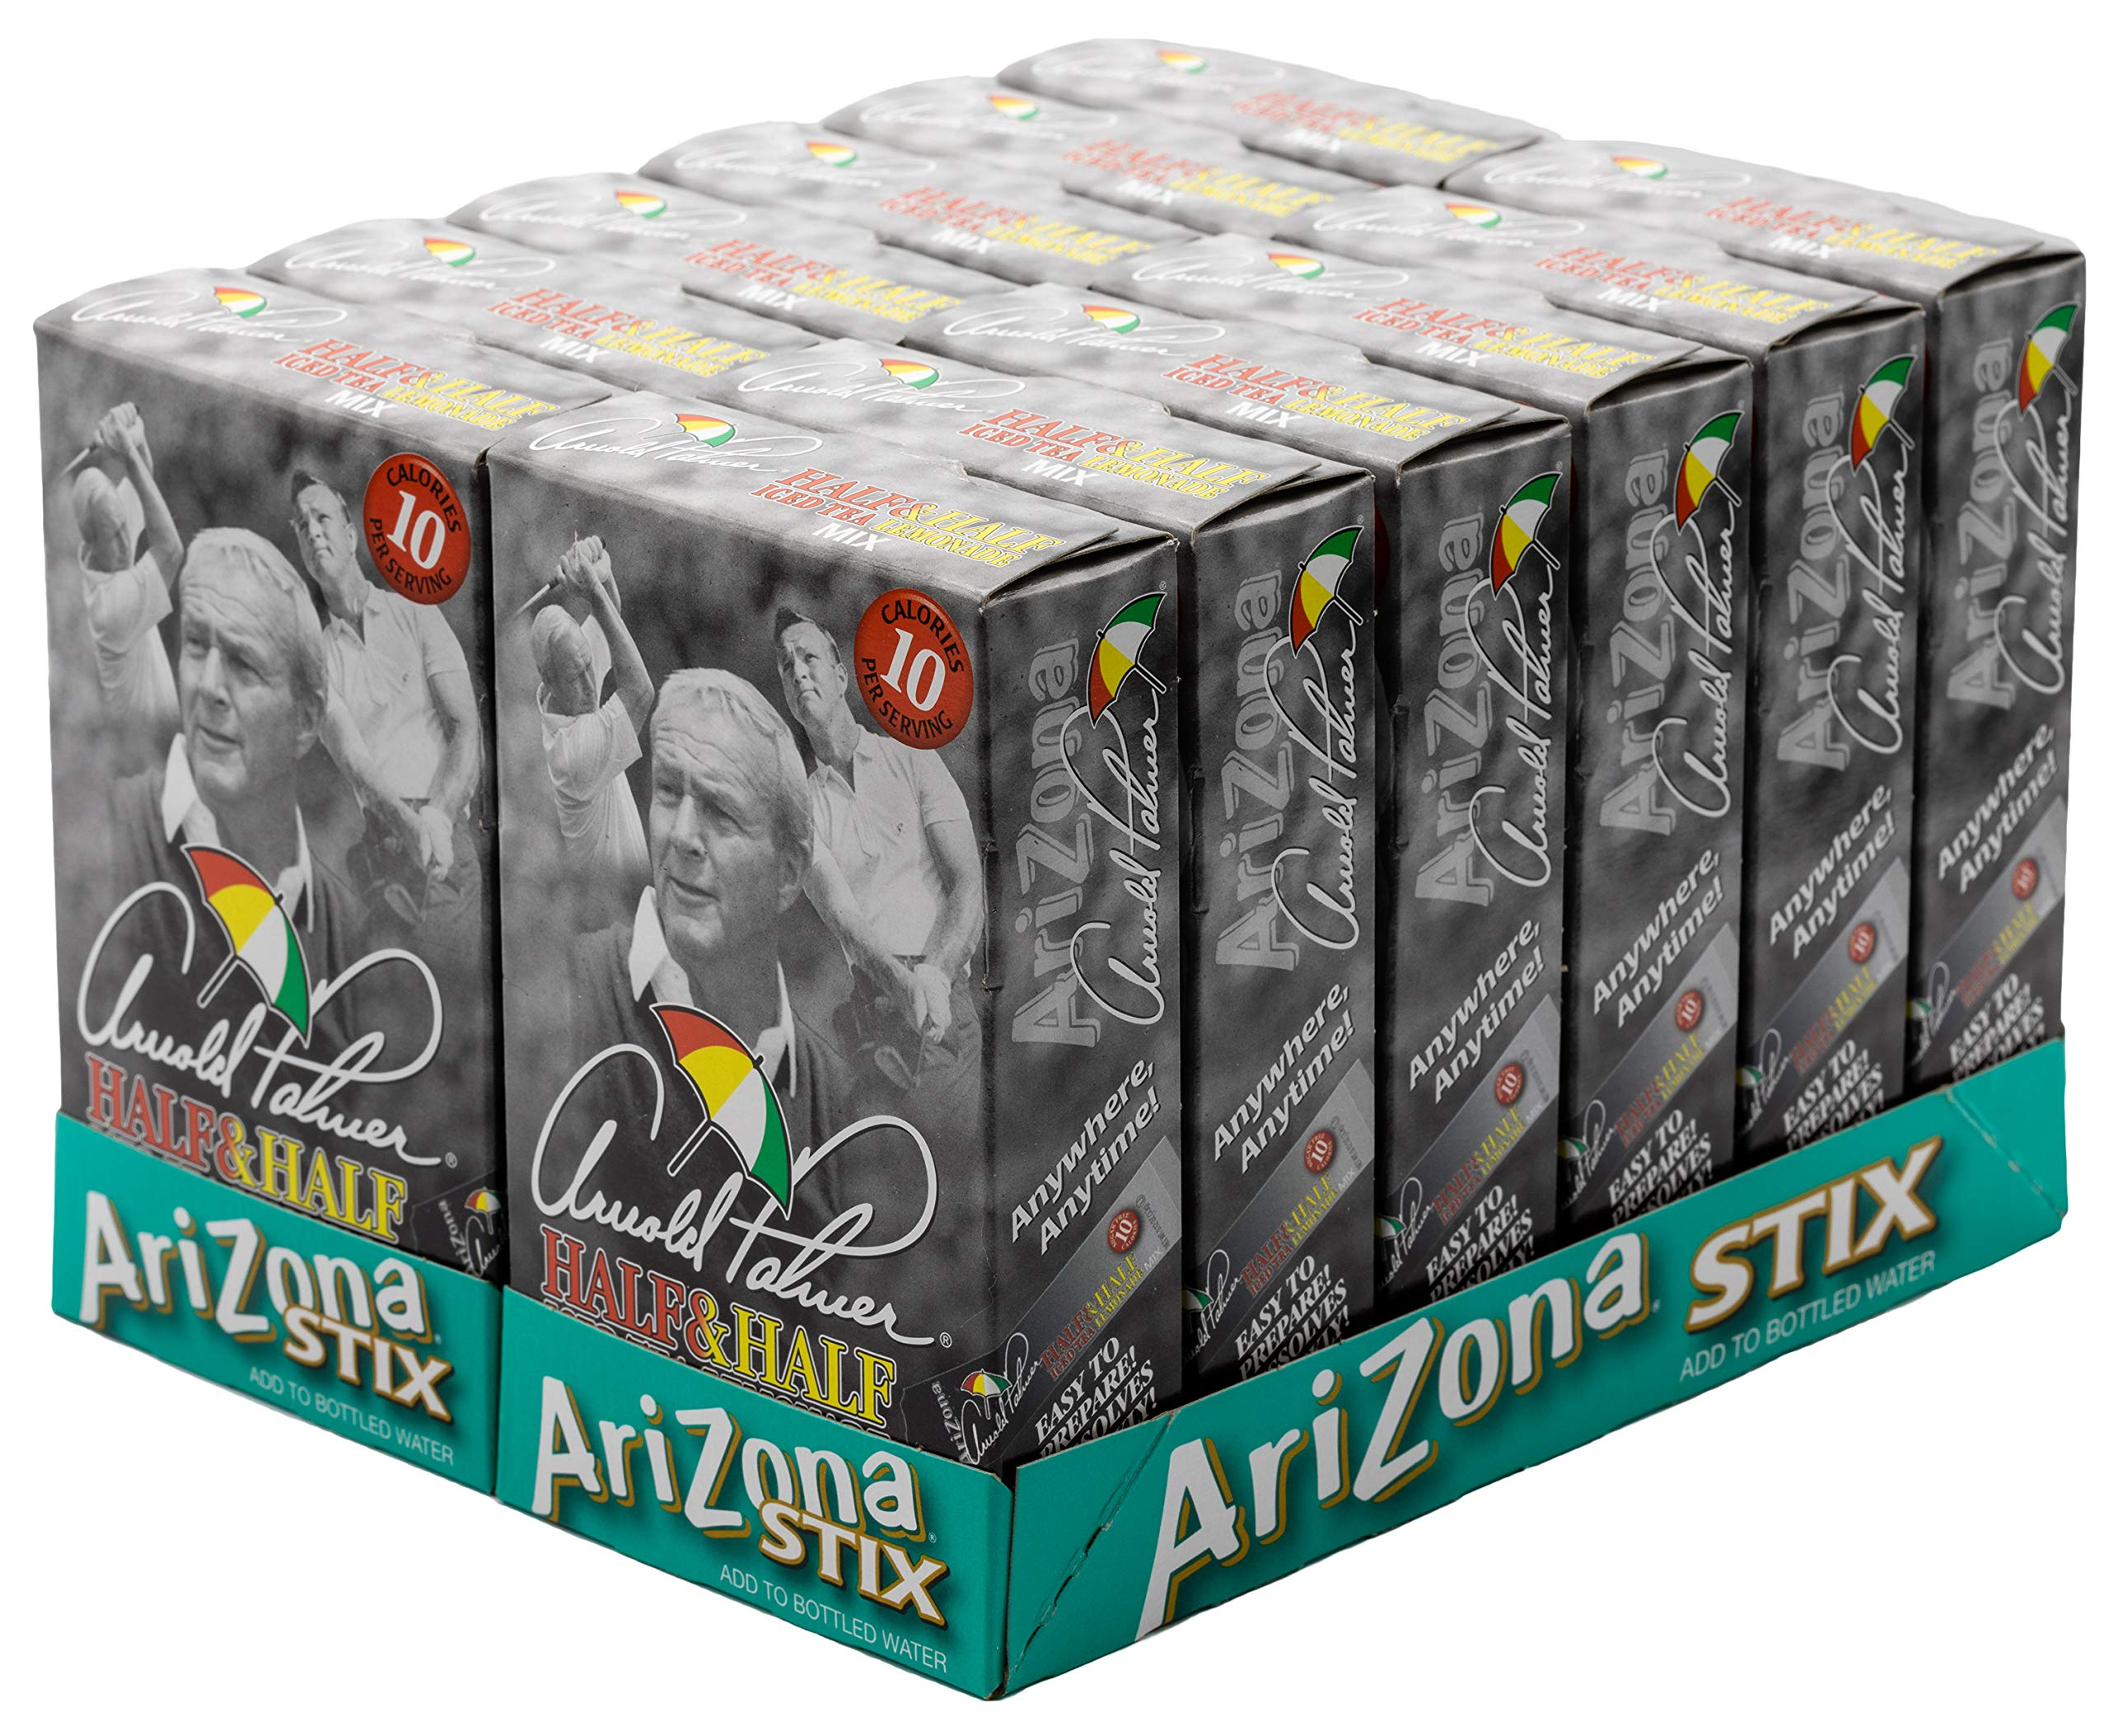 Arizona tea, Arnold Palmer Mix Stix, Half Iced Tea & Half Lemonade, 10 stix, 1.2 Oz (Pack of 12) by Arizona